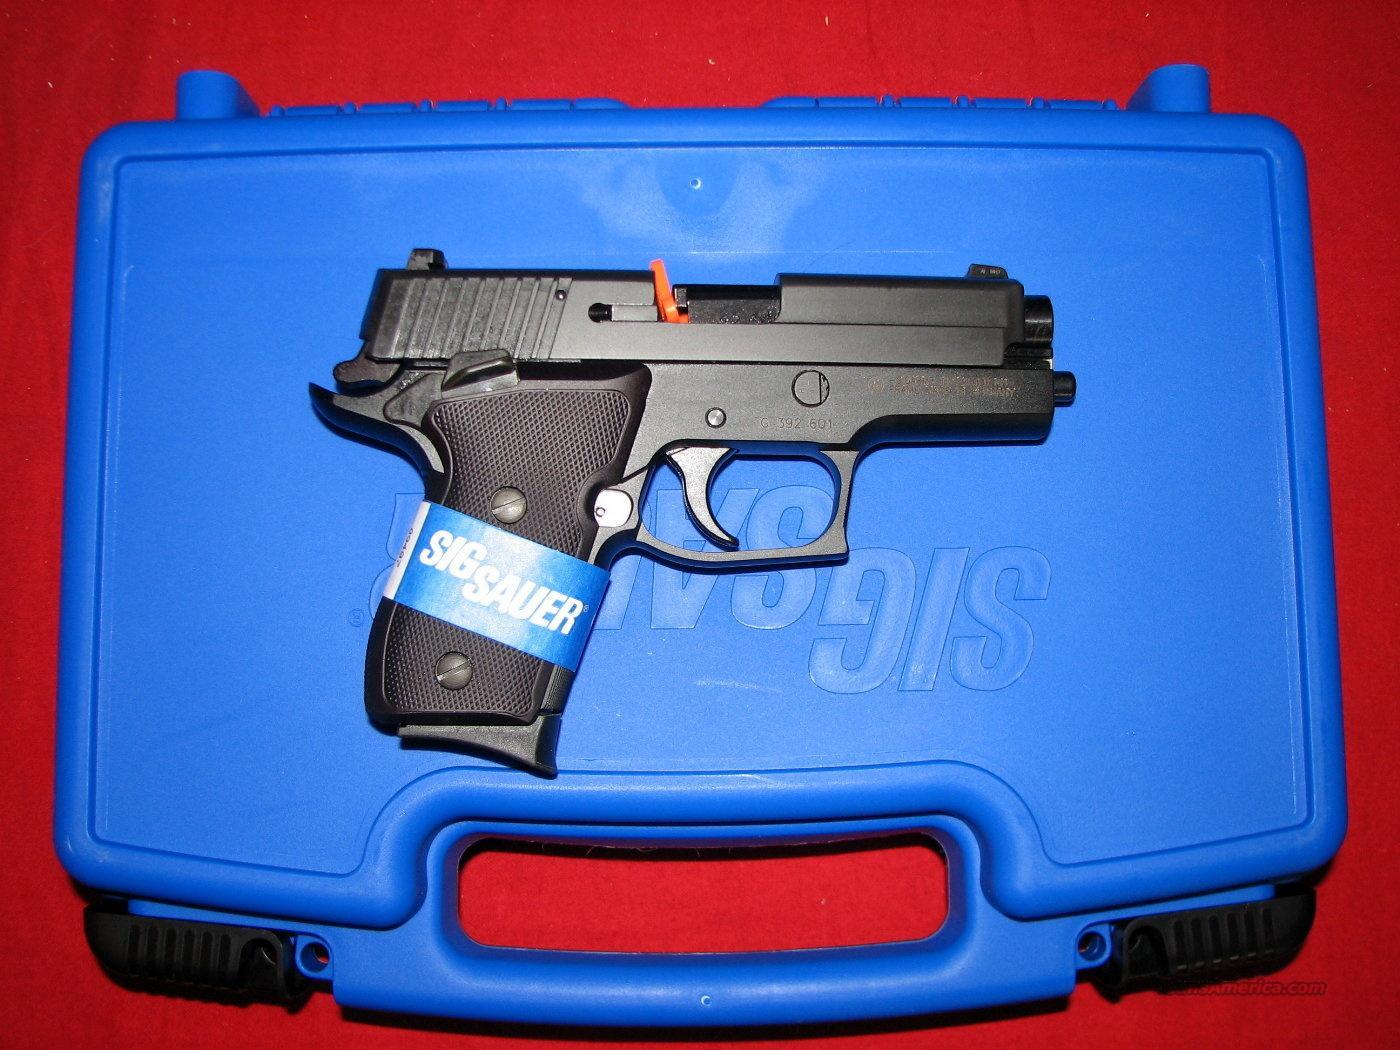 P220 Compact 45acp w/Night Sights  Guns > Pistols > Sig - Sauer/Sigarms Pistols > P220